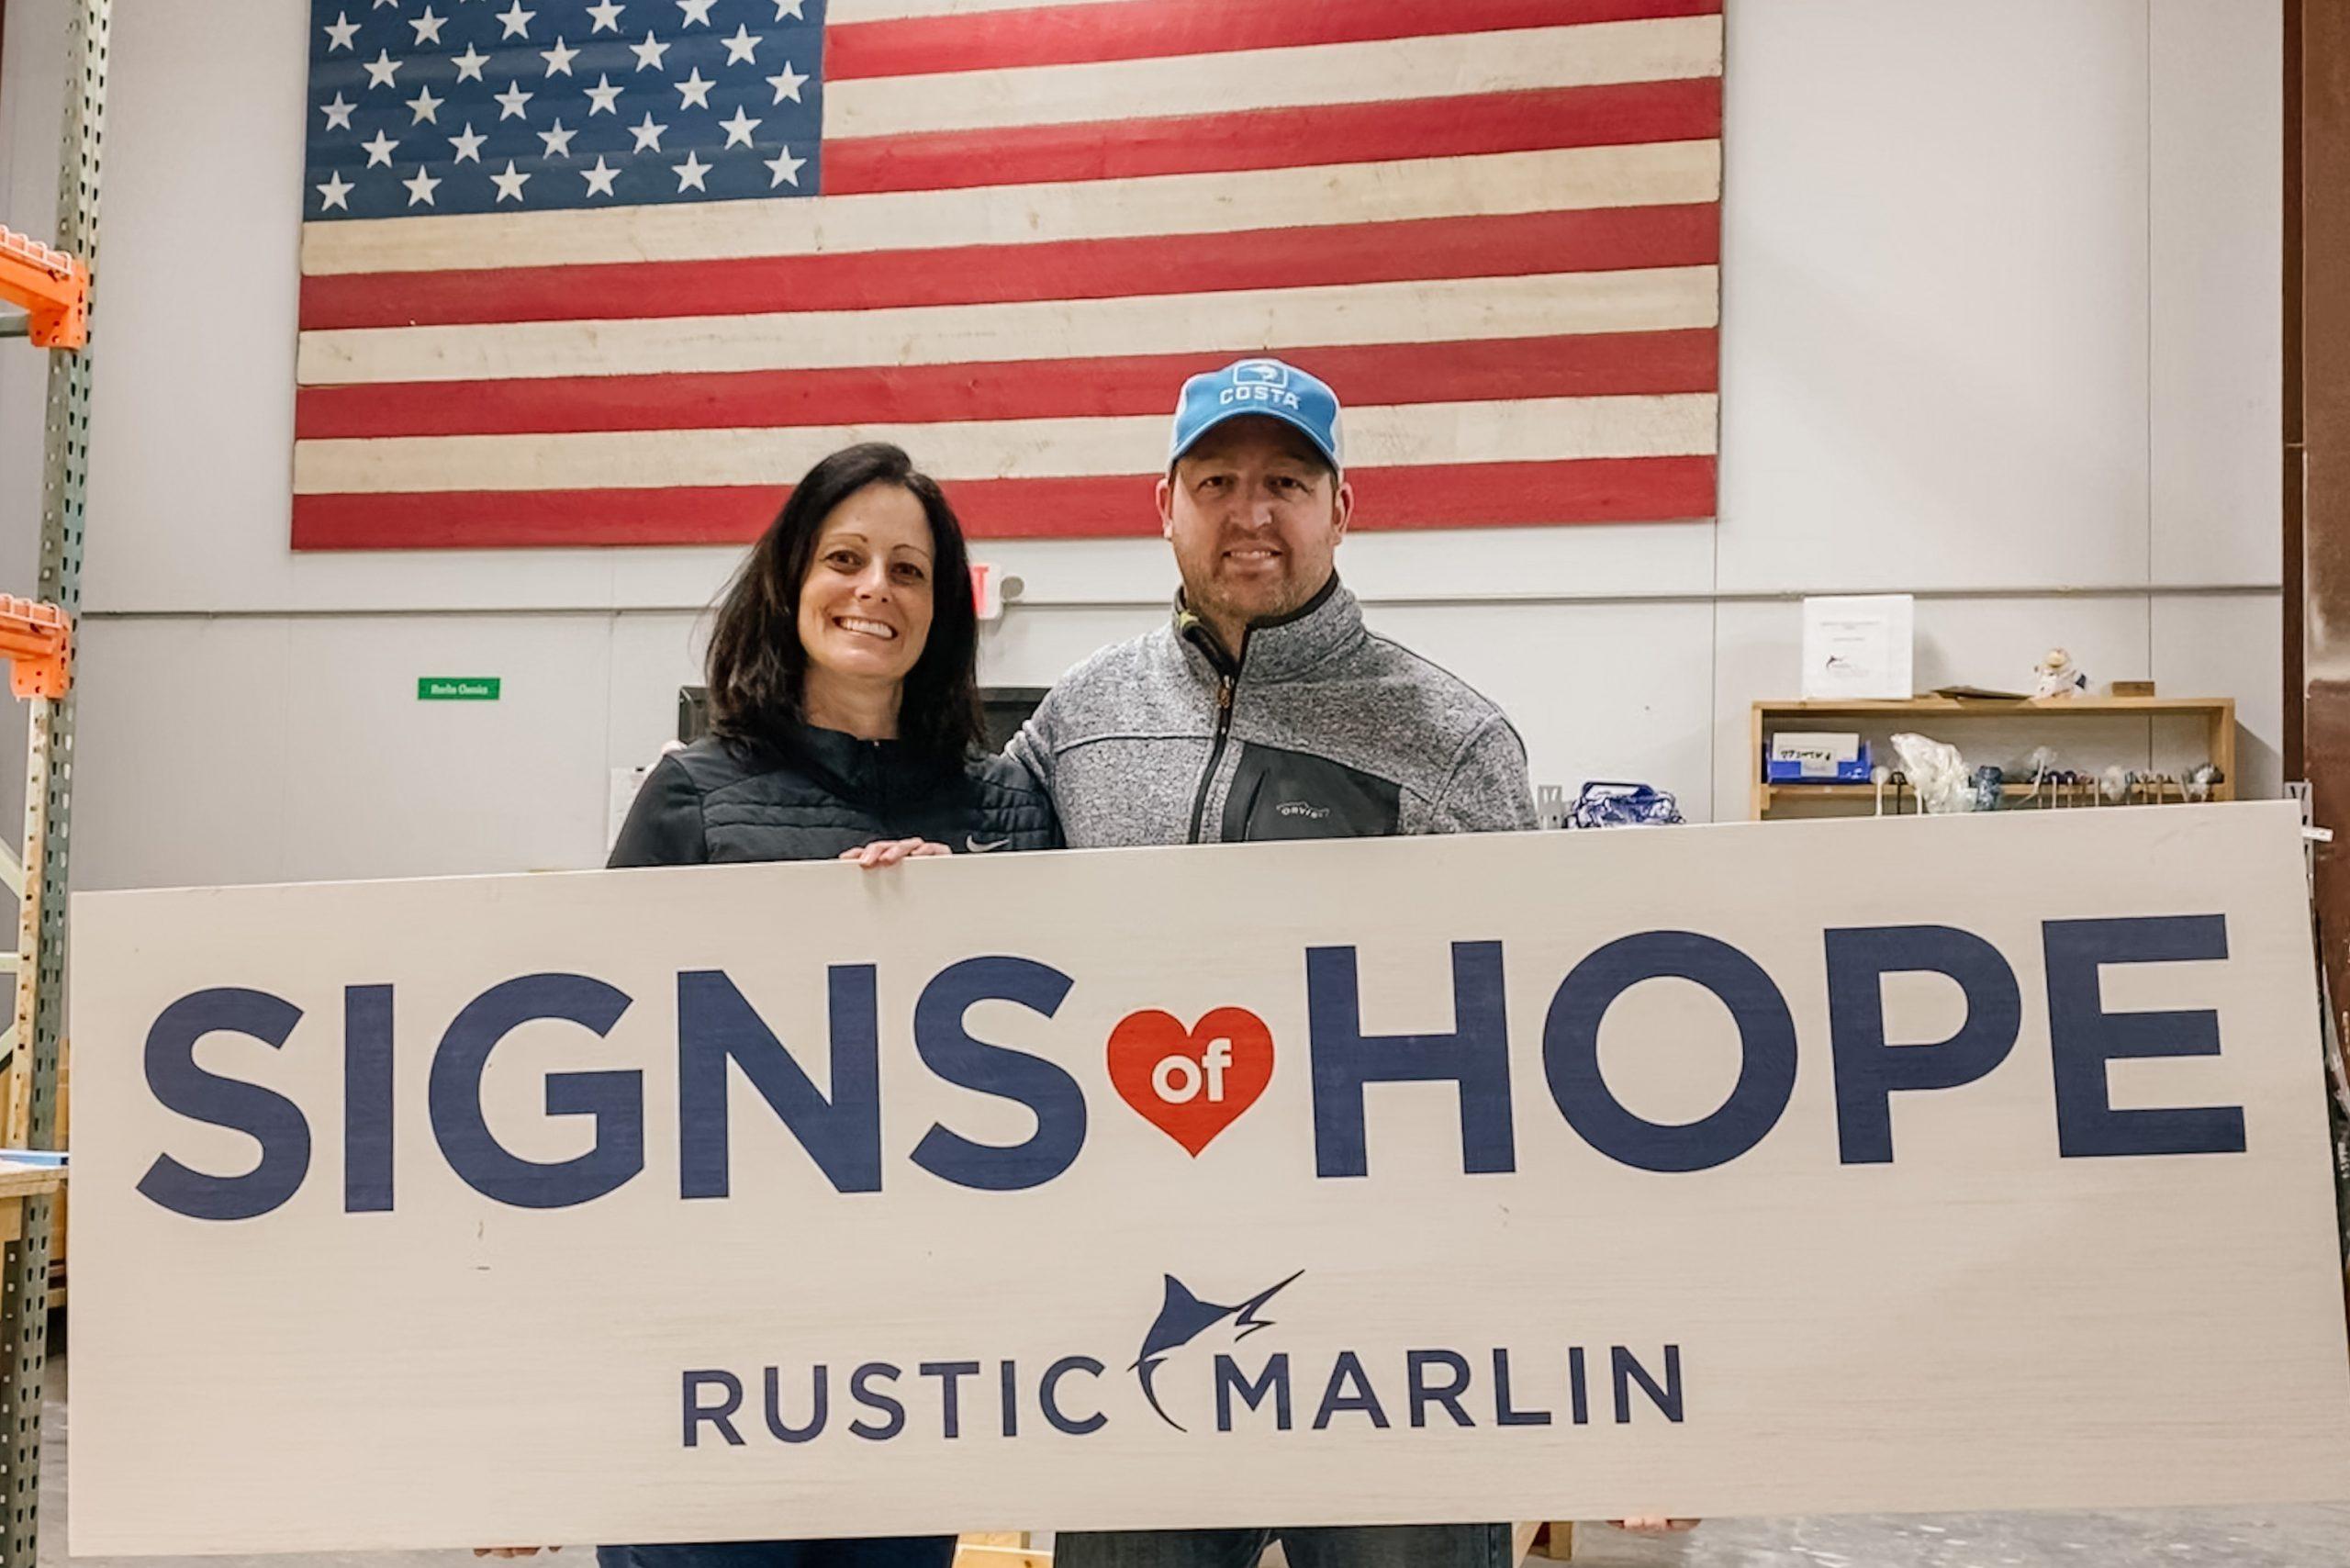 Rustic Marlin - Boston Moms community feature